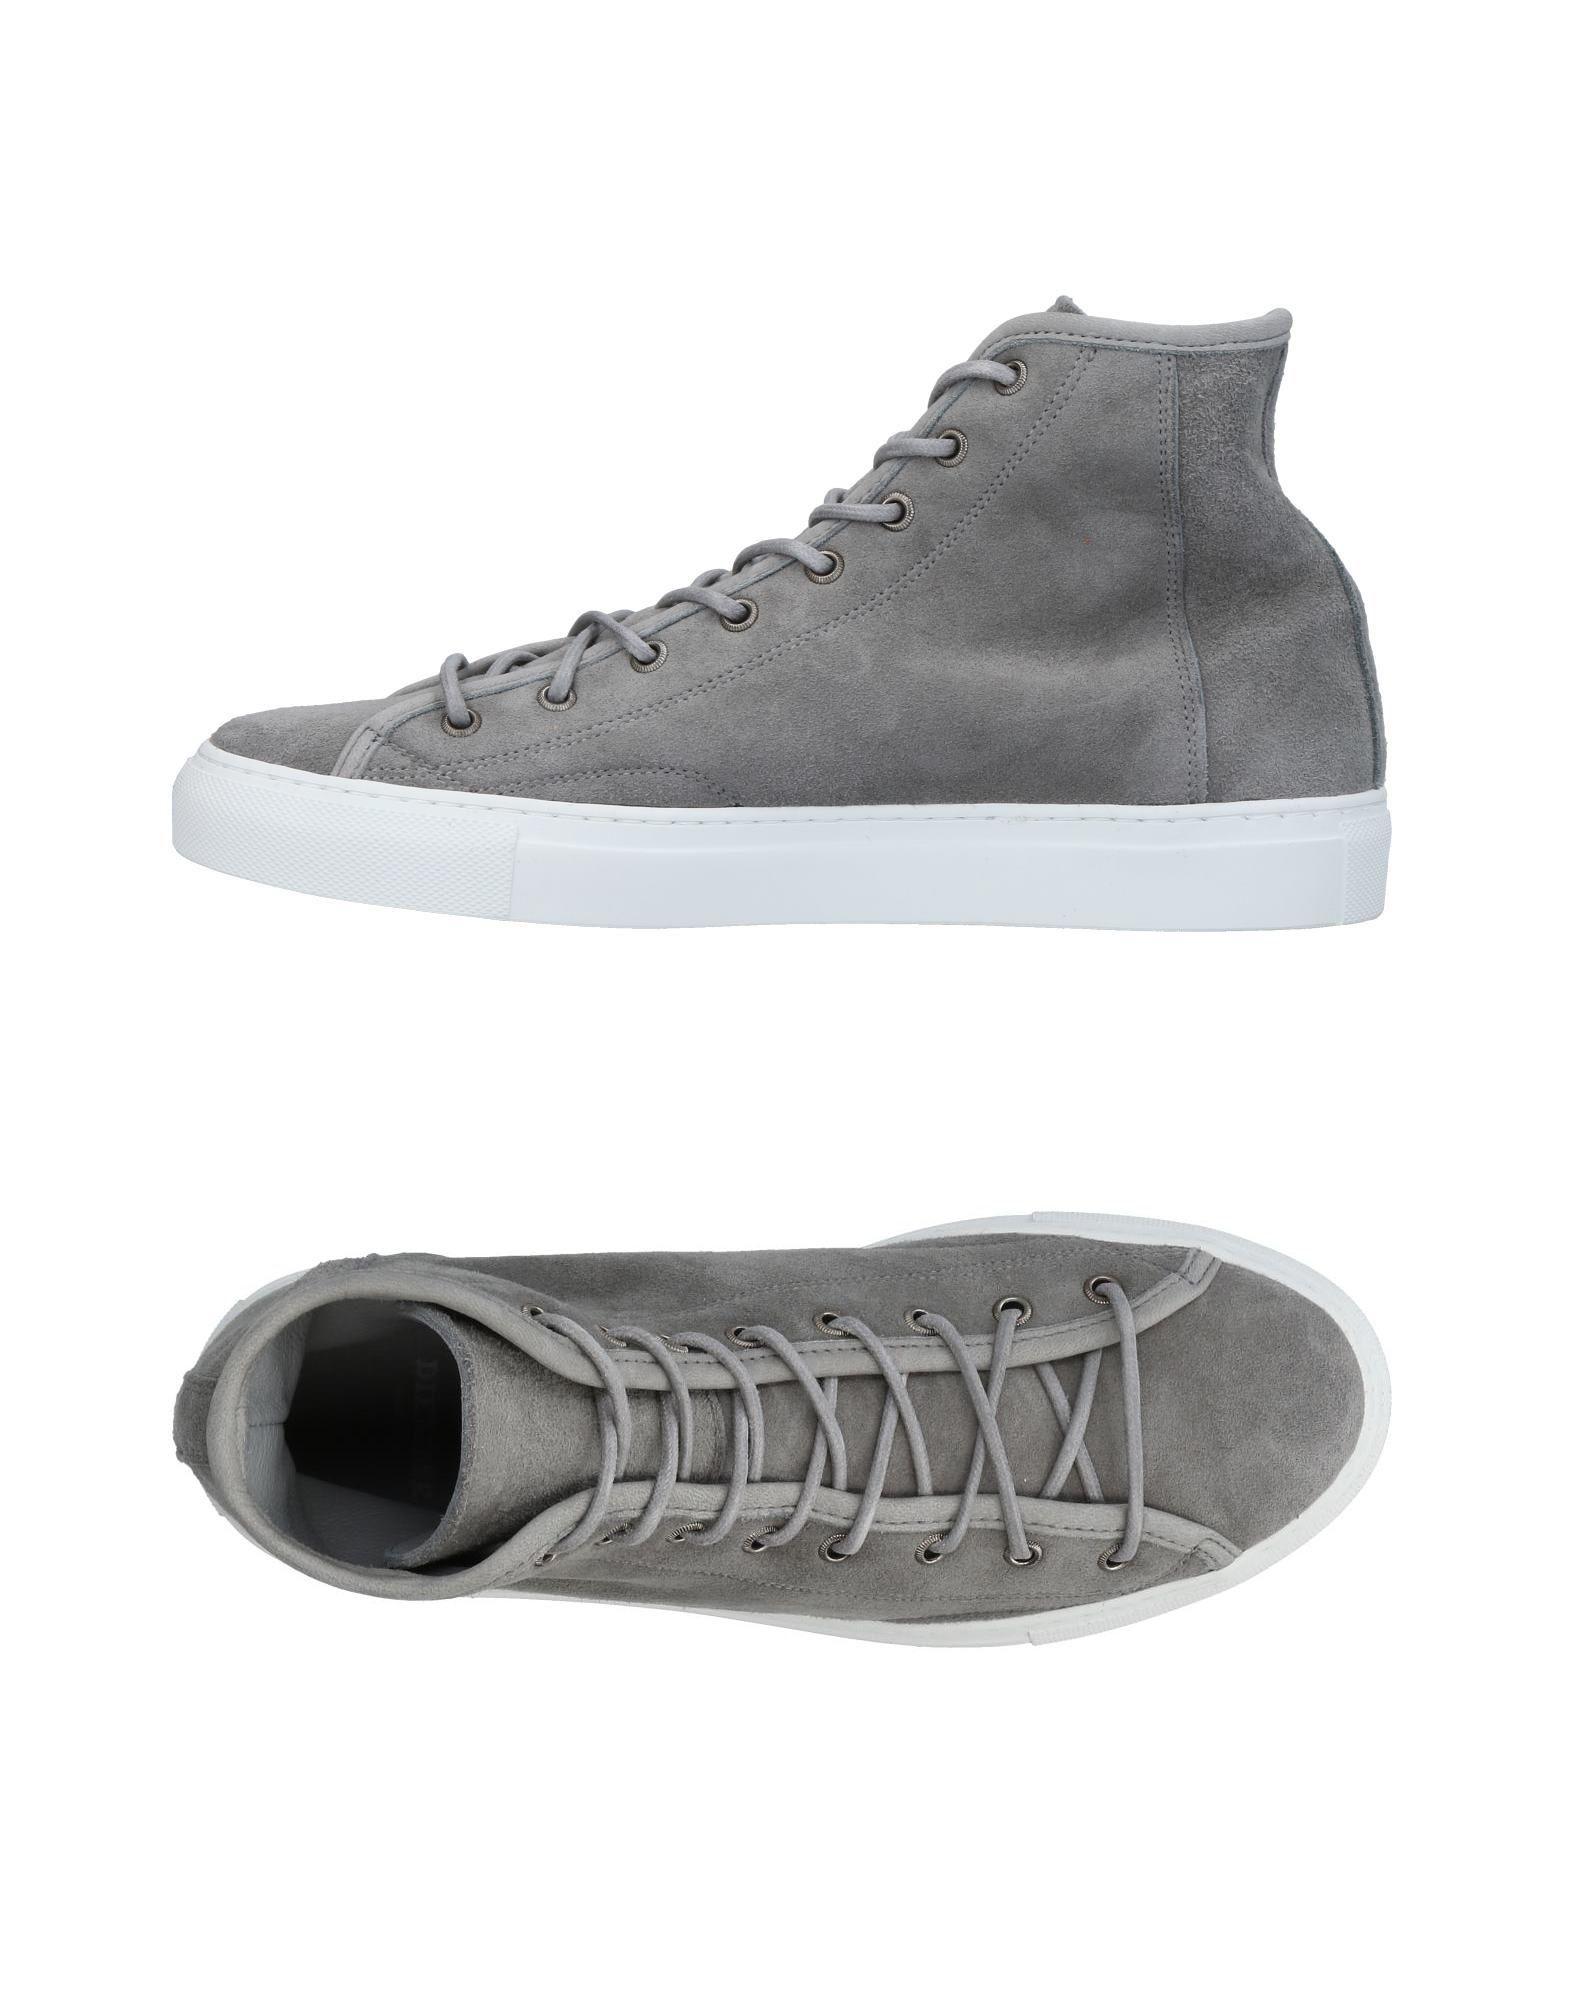 Moda Sneakers Diemme Uomo - 11419680PS